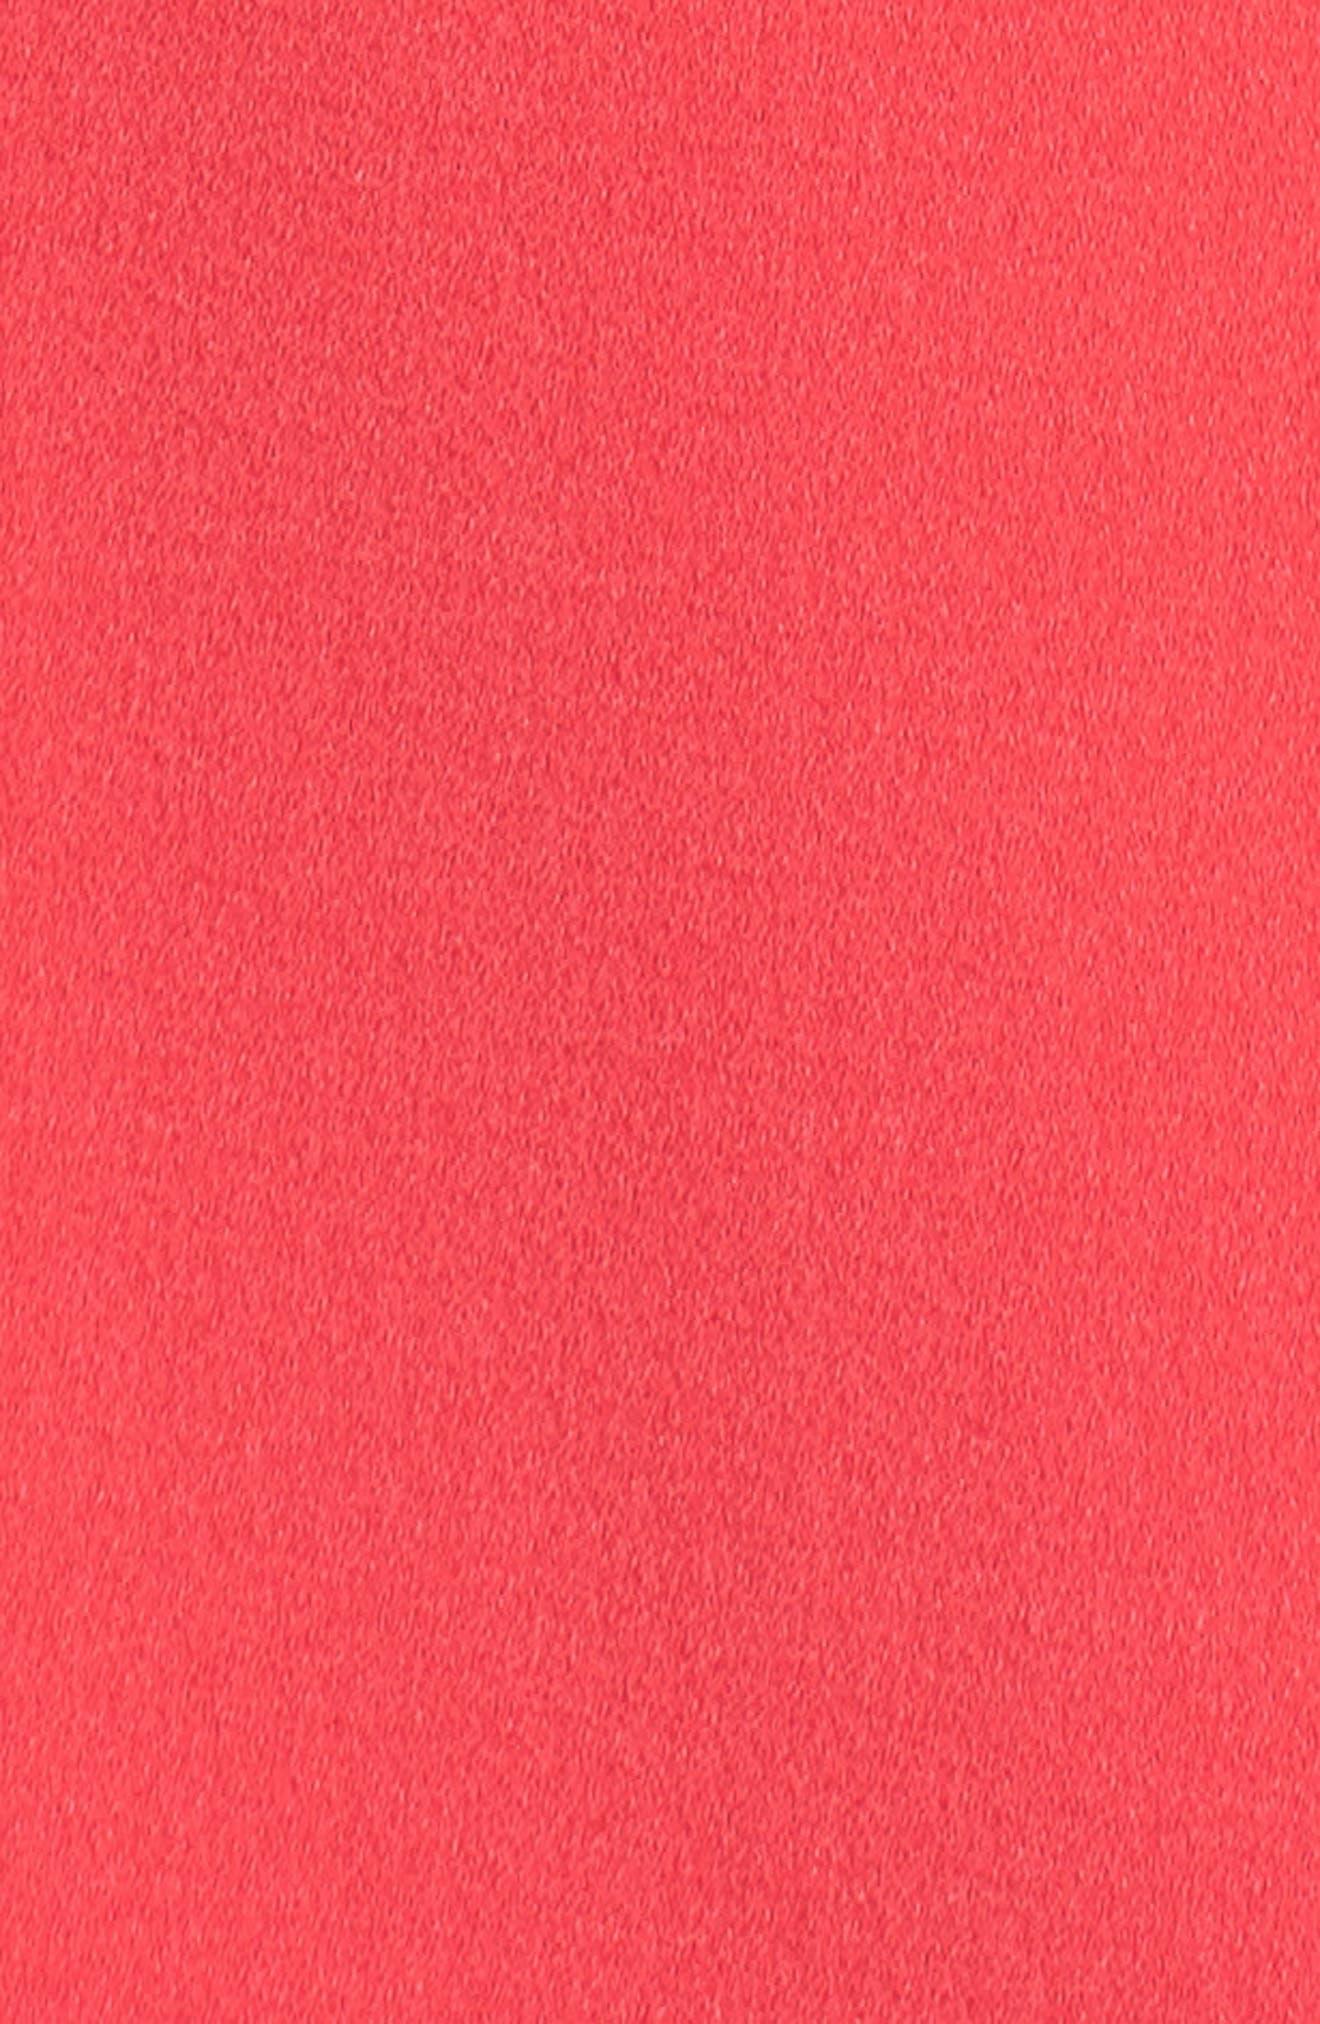 Bell Sleeve Crepe Shift Dress,                             Alternate thumbnail 20, color,